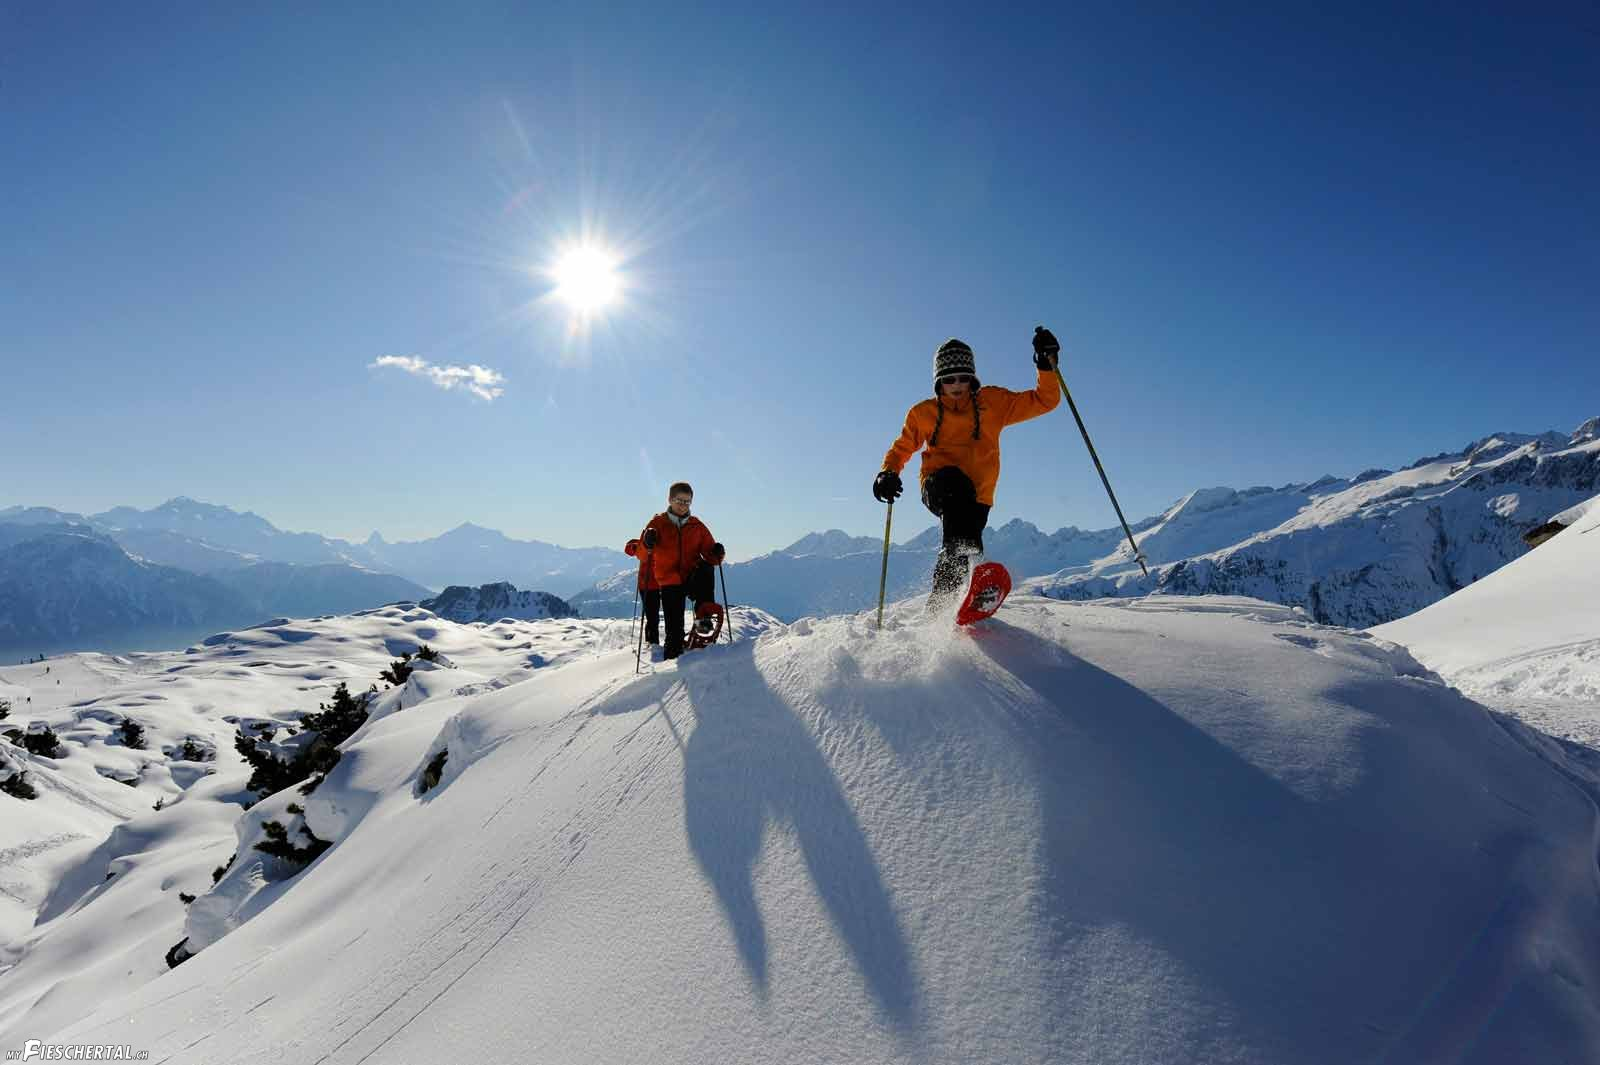 schneeschulaufen